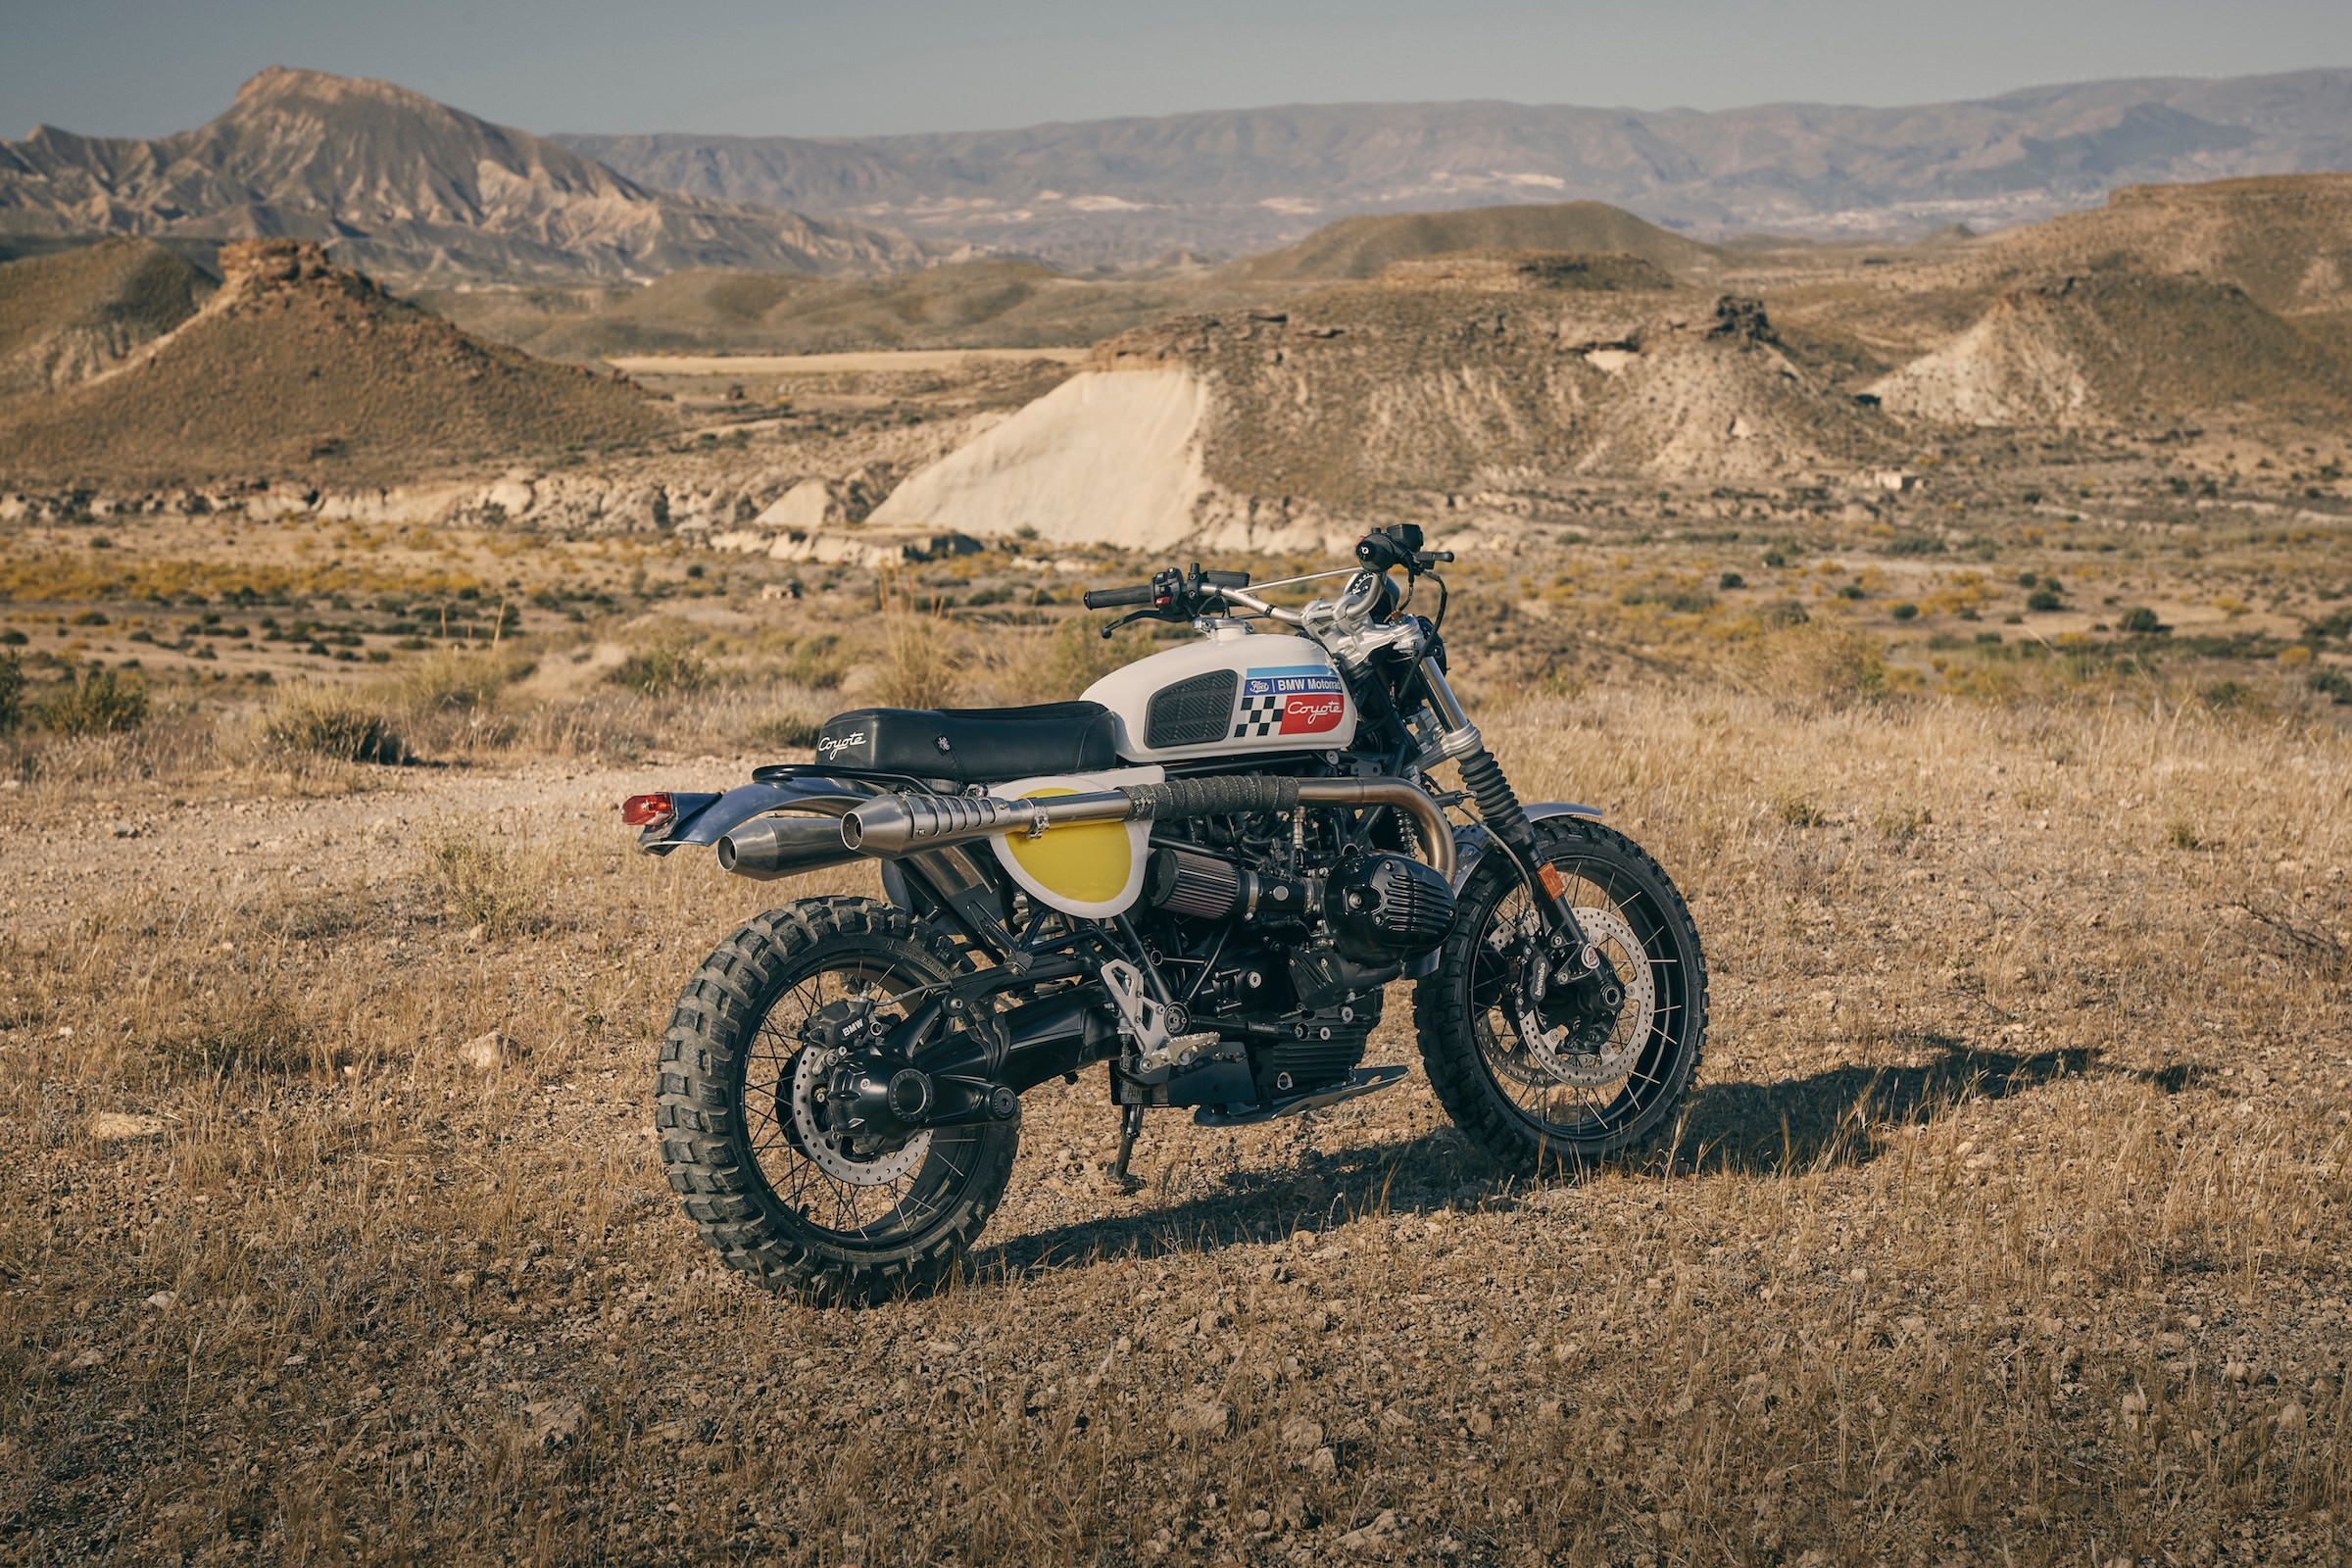 Bmw R Nine T >> The Fuel Motorcycles Coyote BMW R nineT Urban G/S